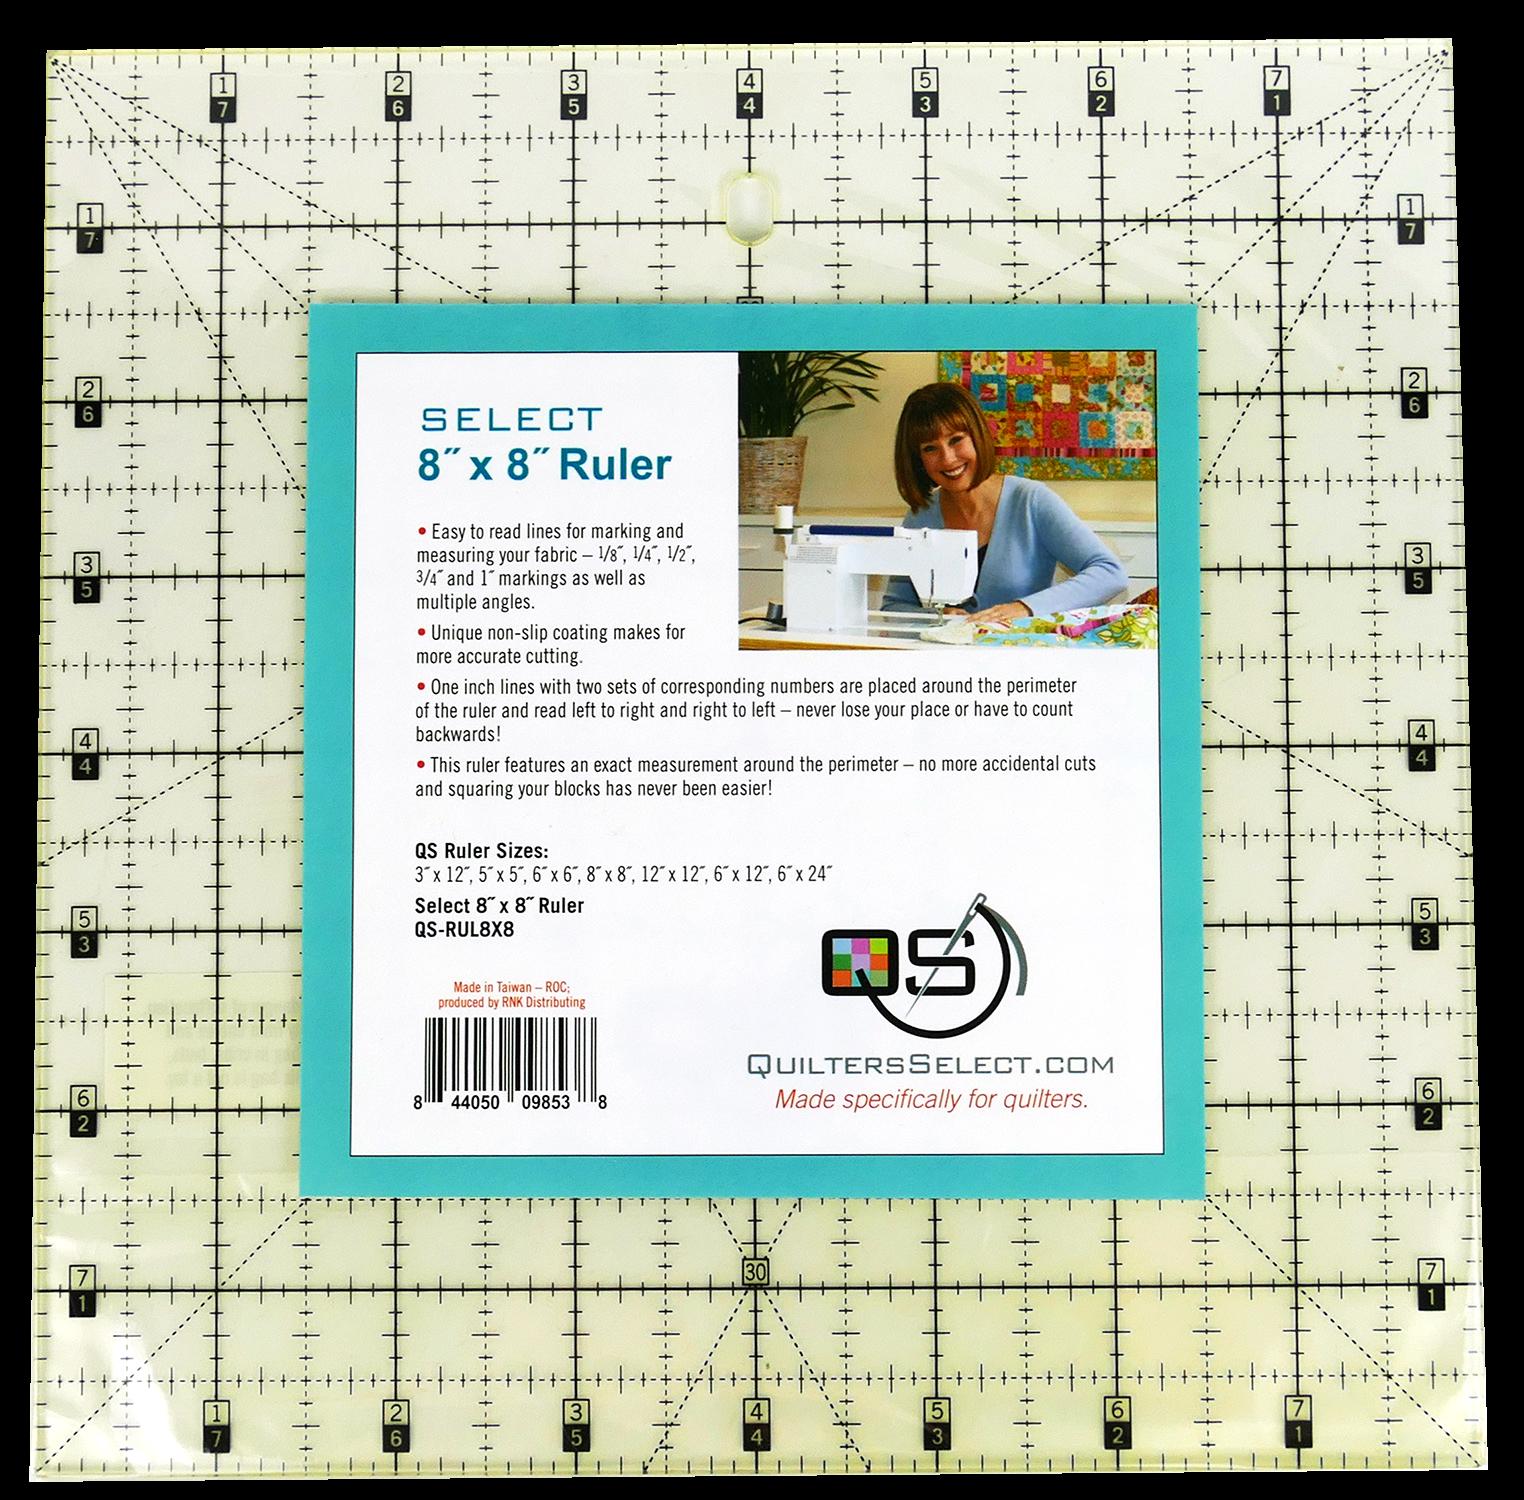 QS Select 8 x 8 Non-Slip Ruler